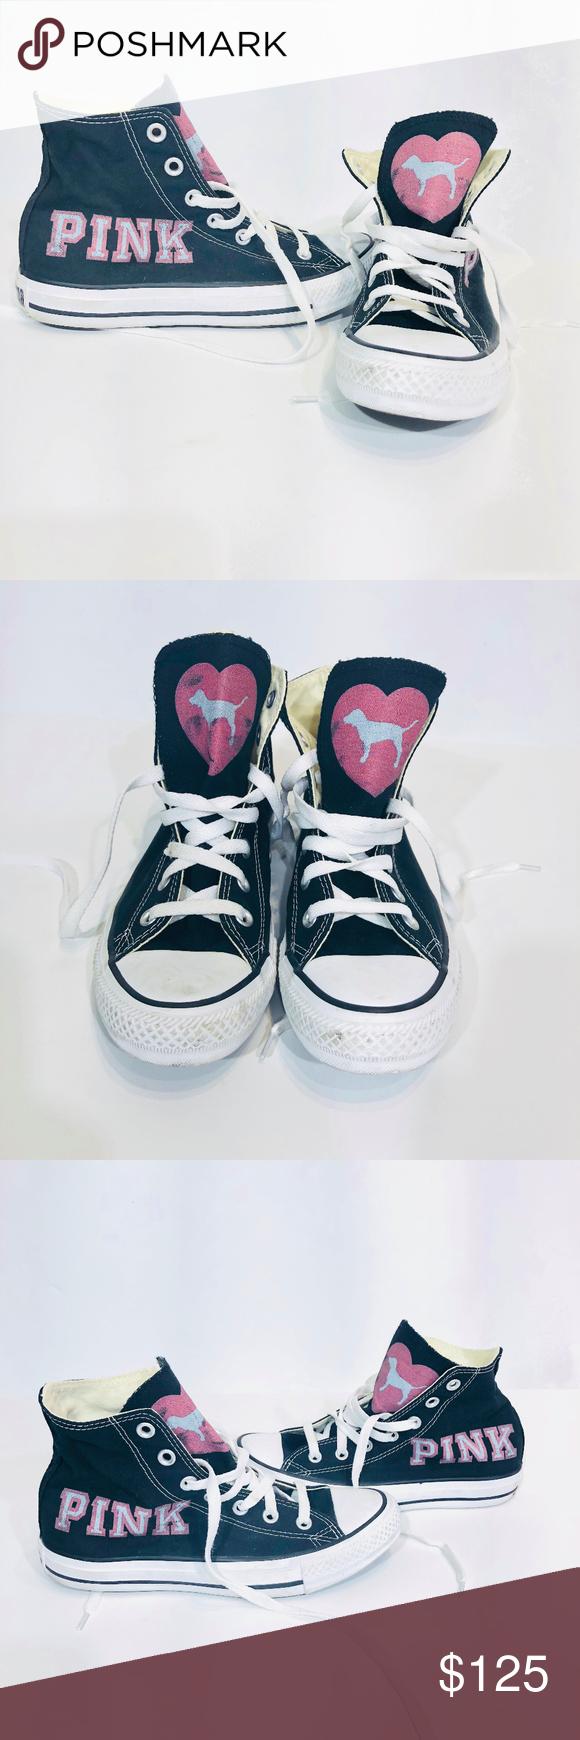 Victoria S Secret Pink Converse Display Shoes Sz 7 My Posh Closet